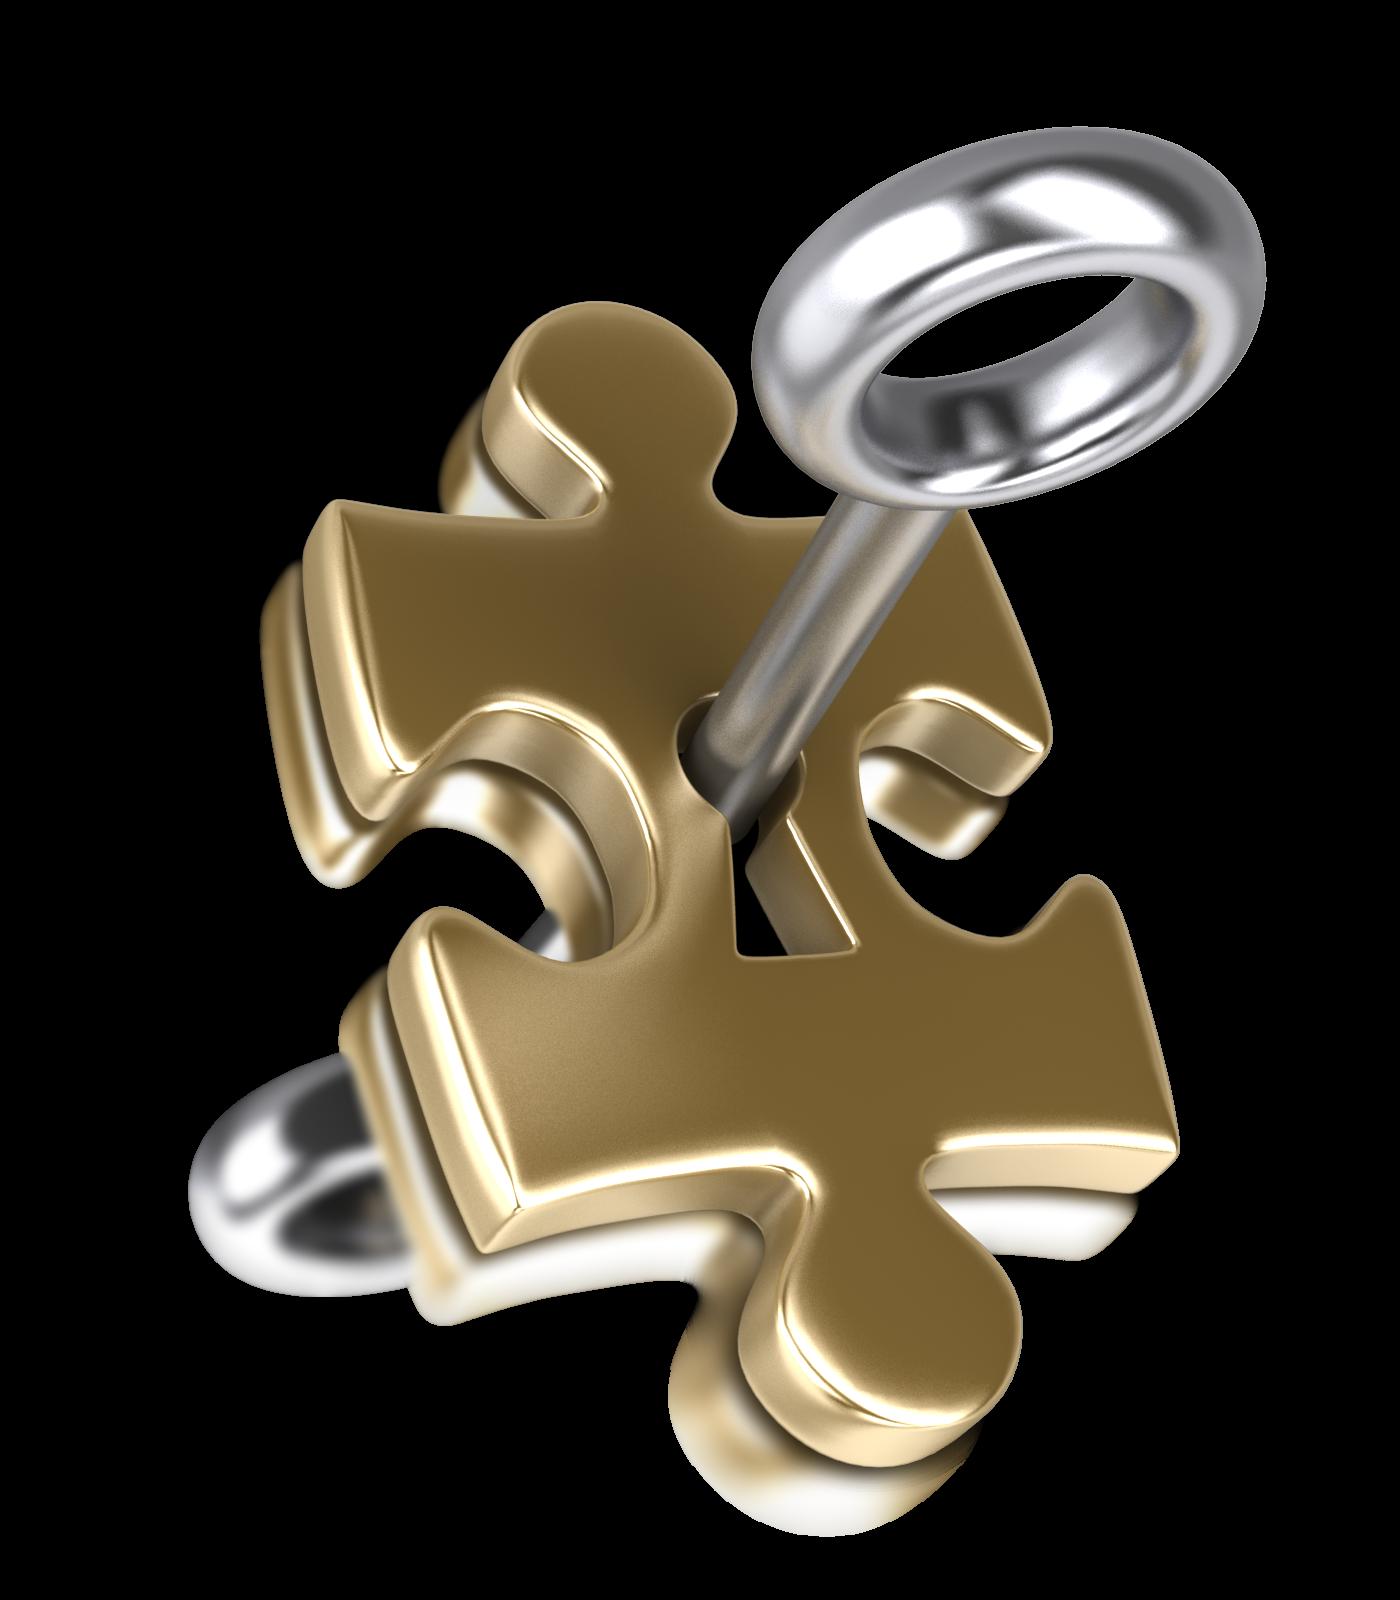 KeyPuzzle